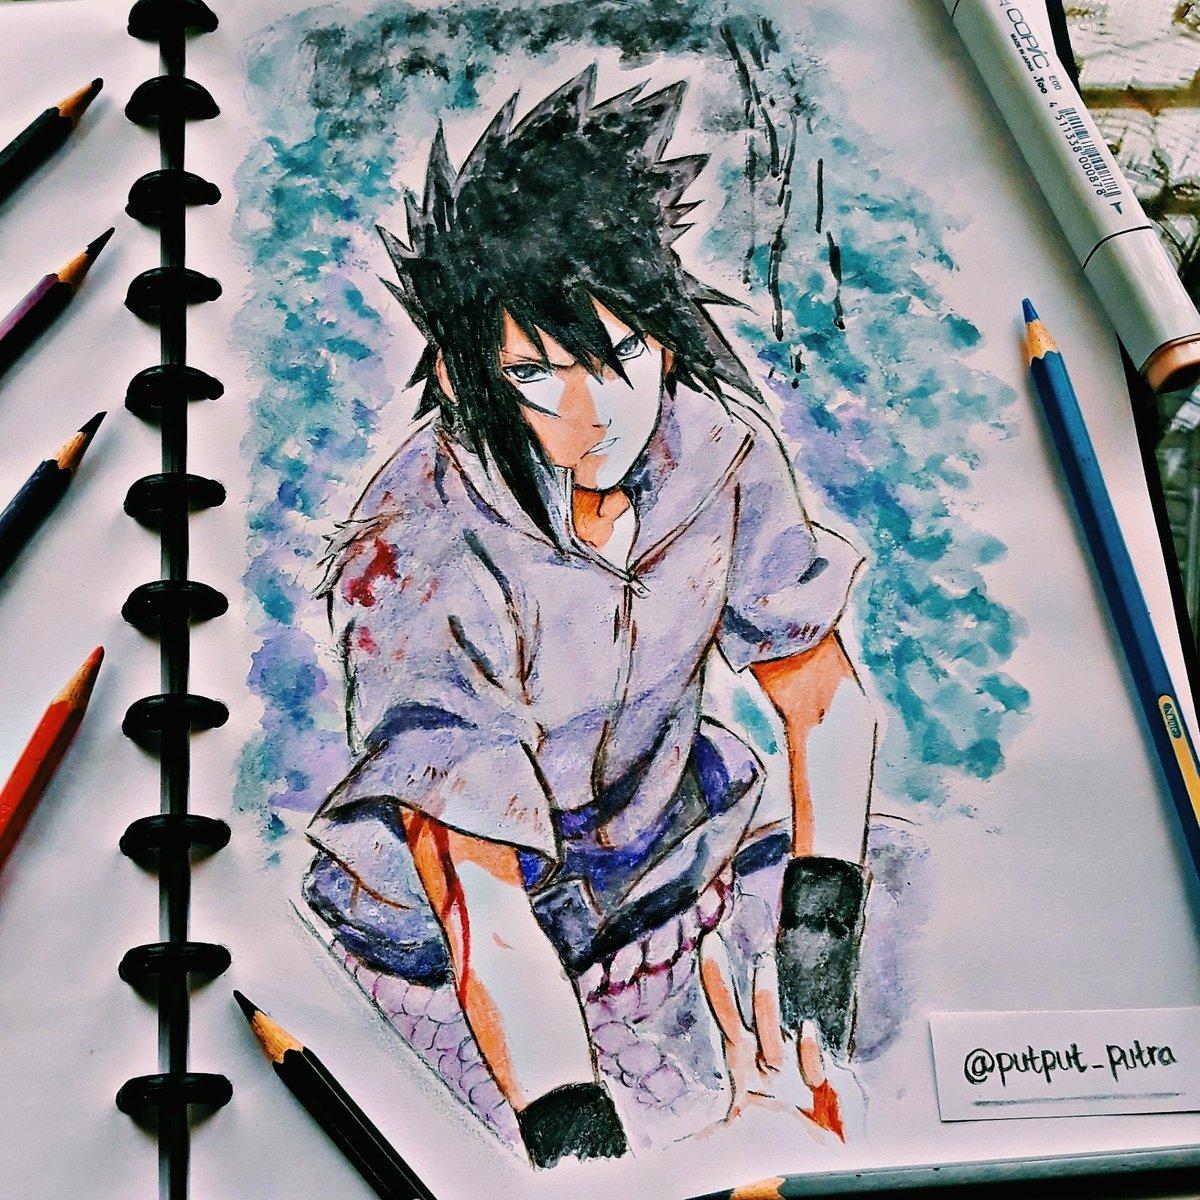 Yaumil Putra On Twitter   Sasuke Uchiha  Drawing  Naruto  Anime